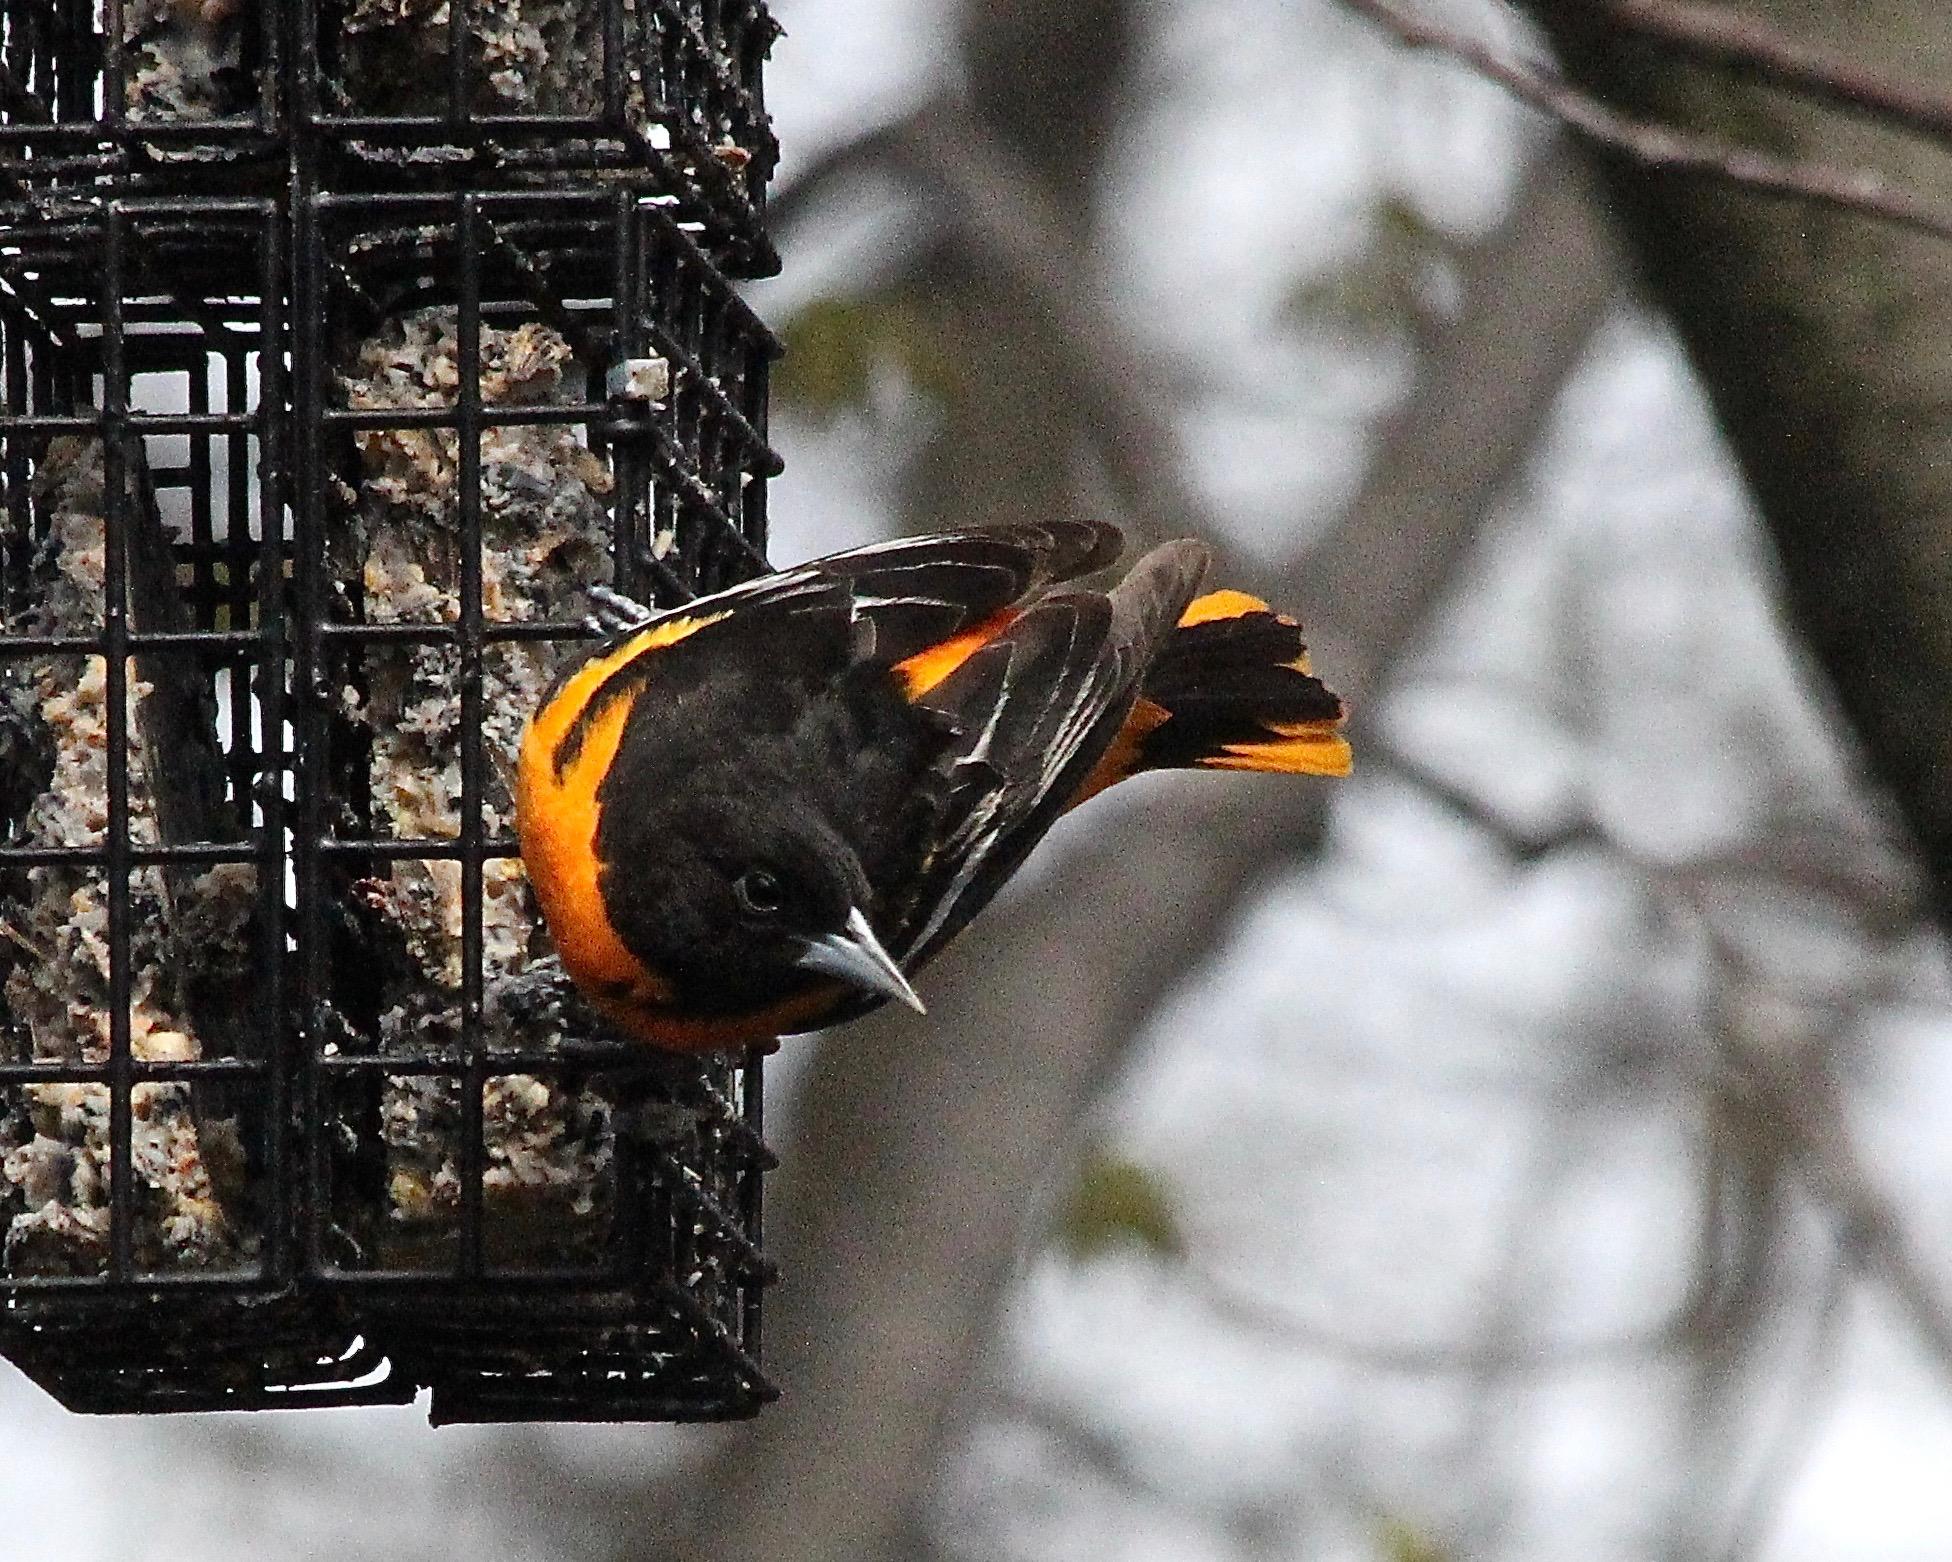 Bird Baltimore Oriole IMG_0100 - Version 2.jpg